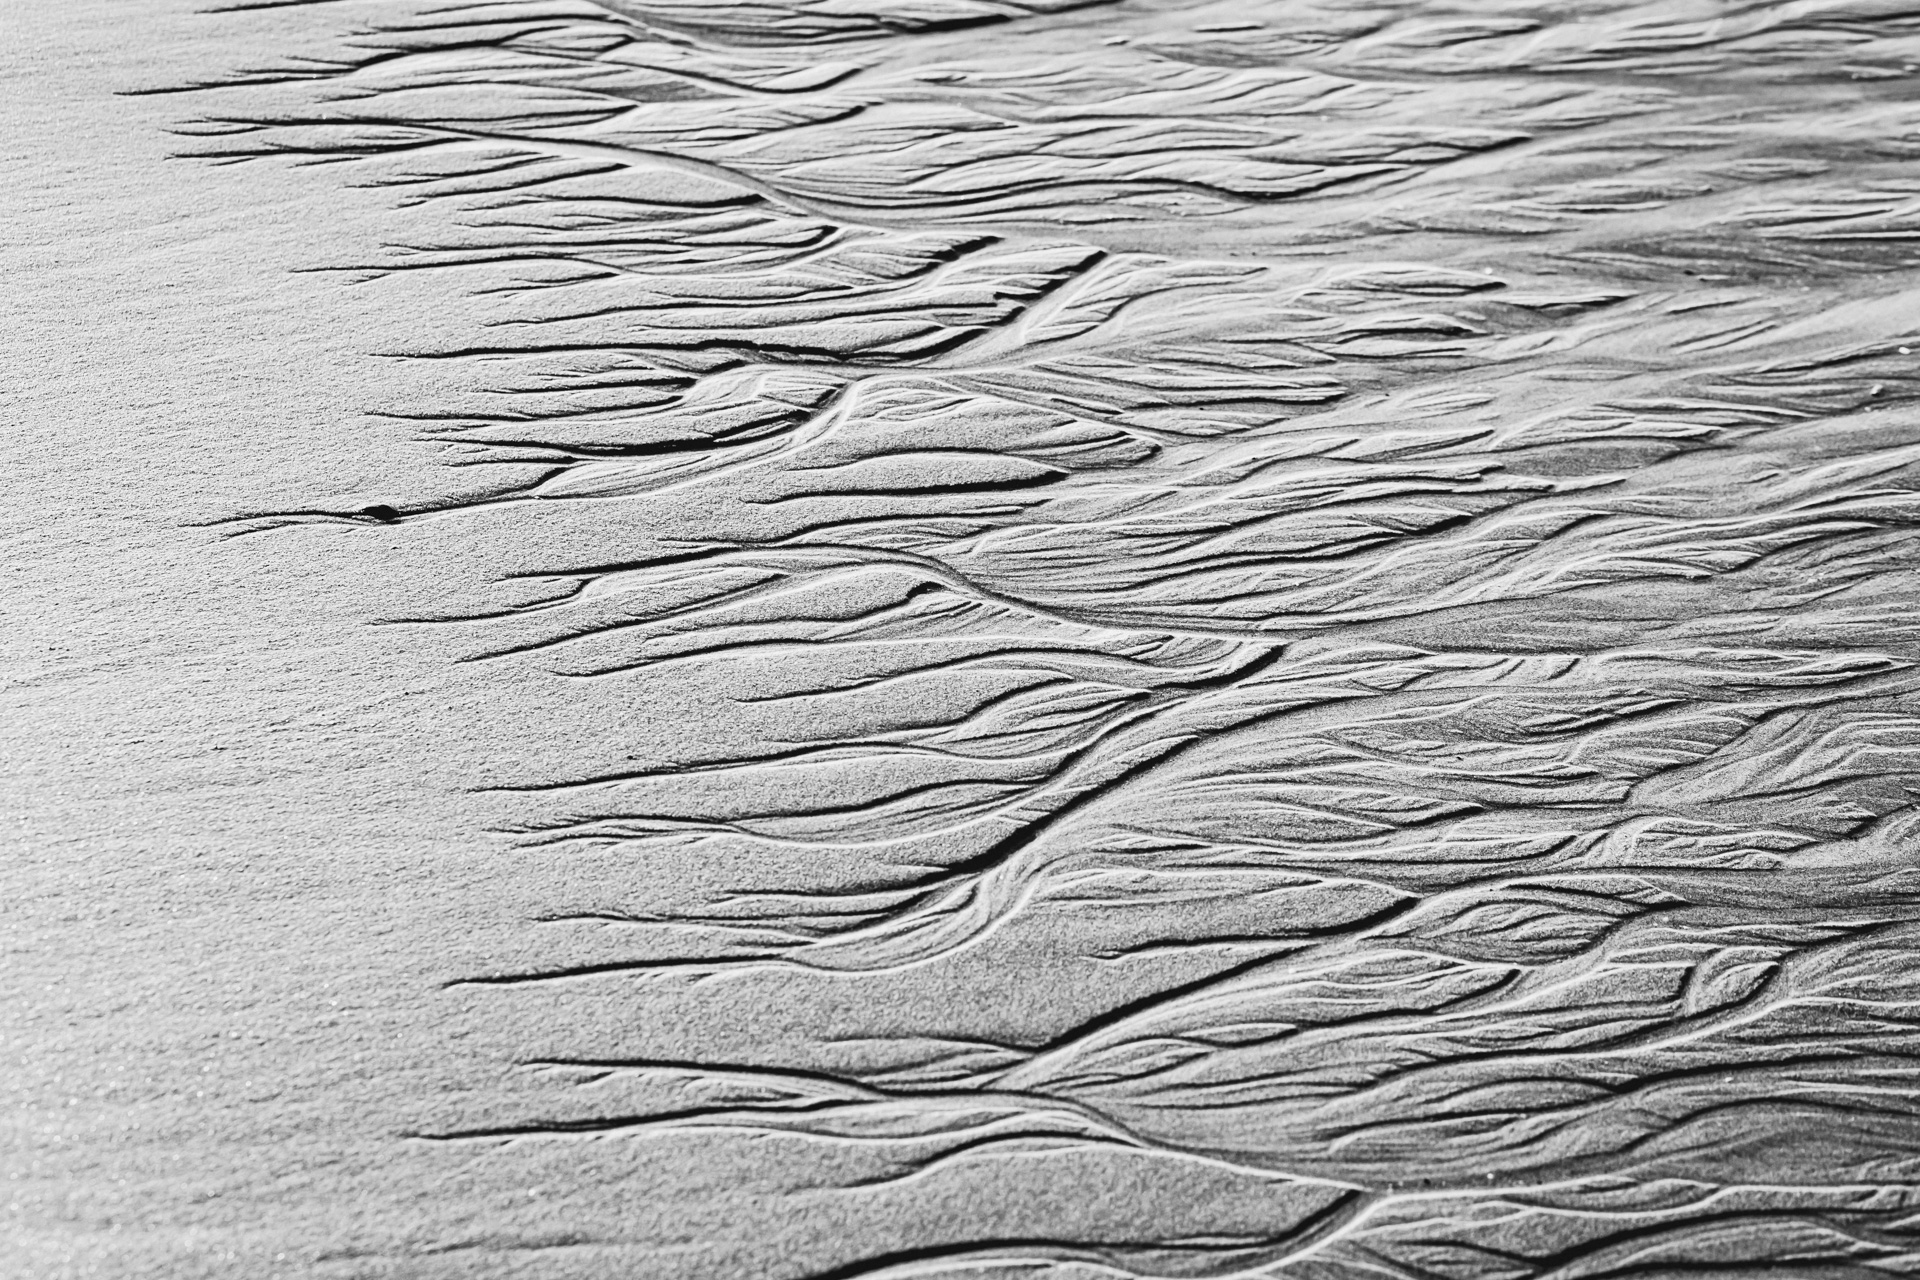 Damien-dohmen-sand-print-lx-one-17